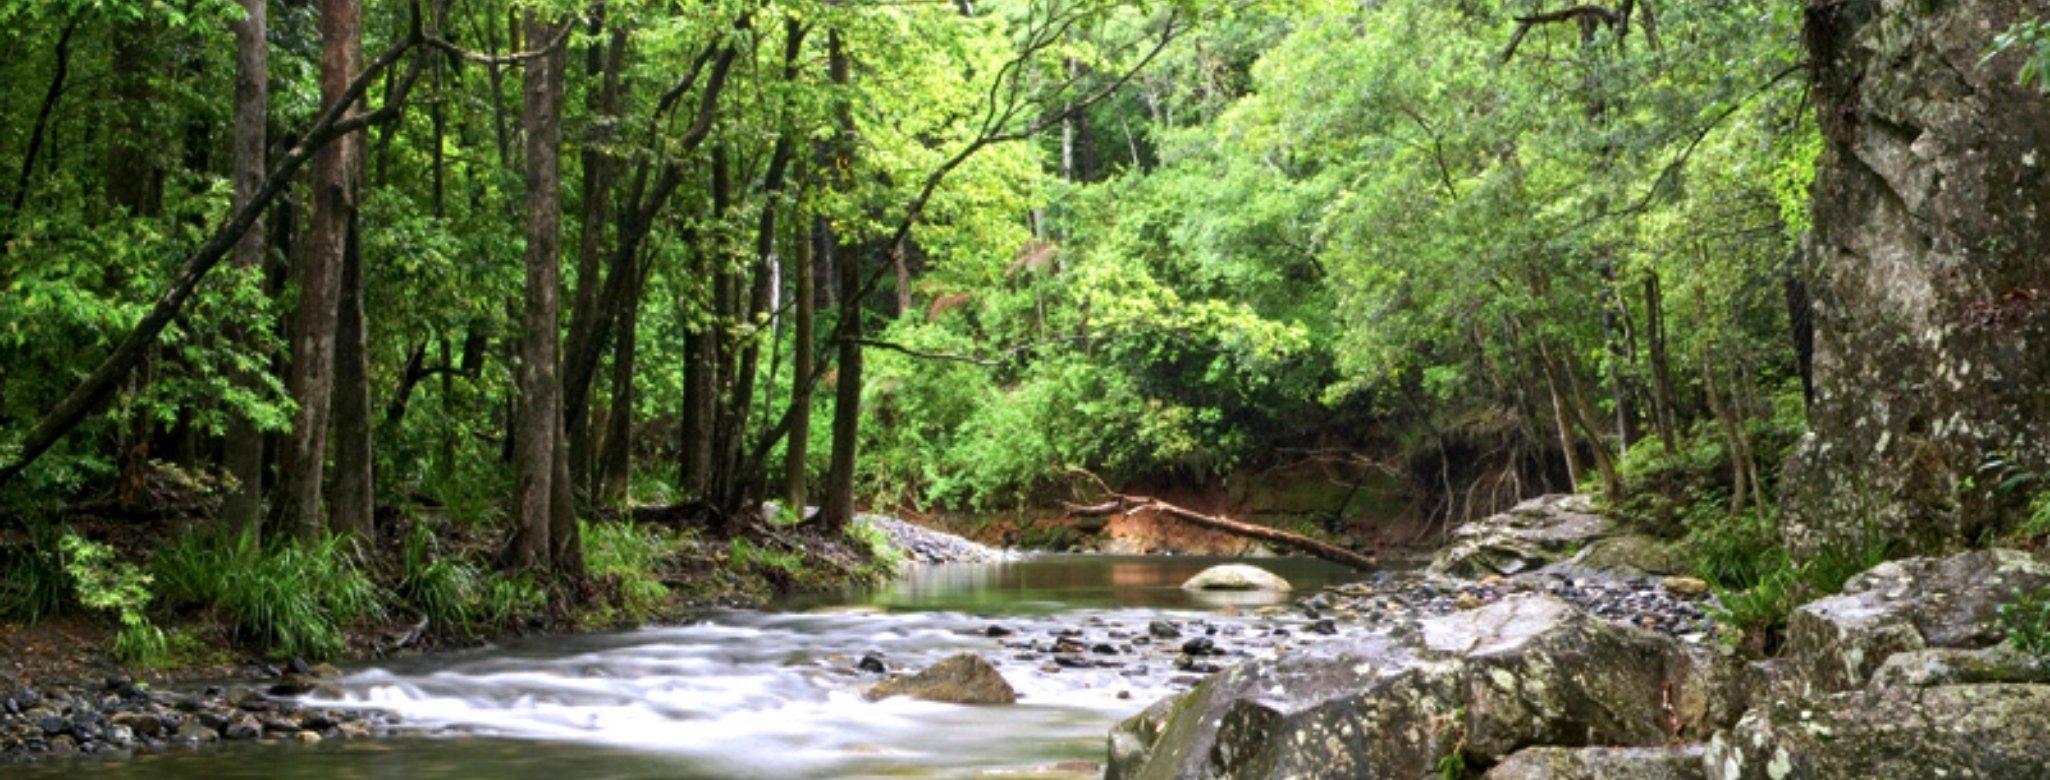 Never Never Creek, Promised Lands, Bellingen, New South Wales